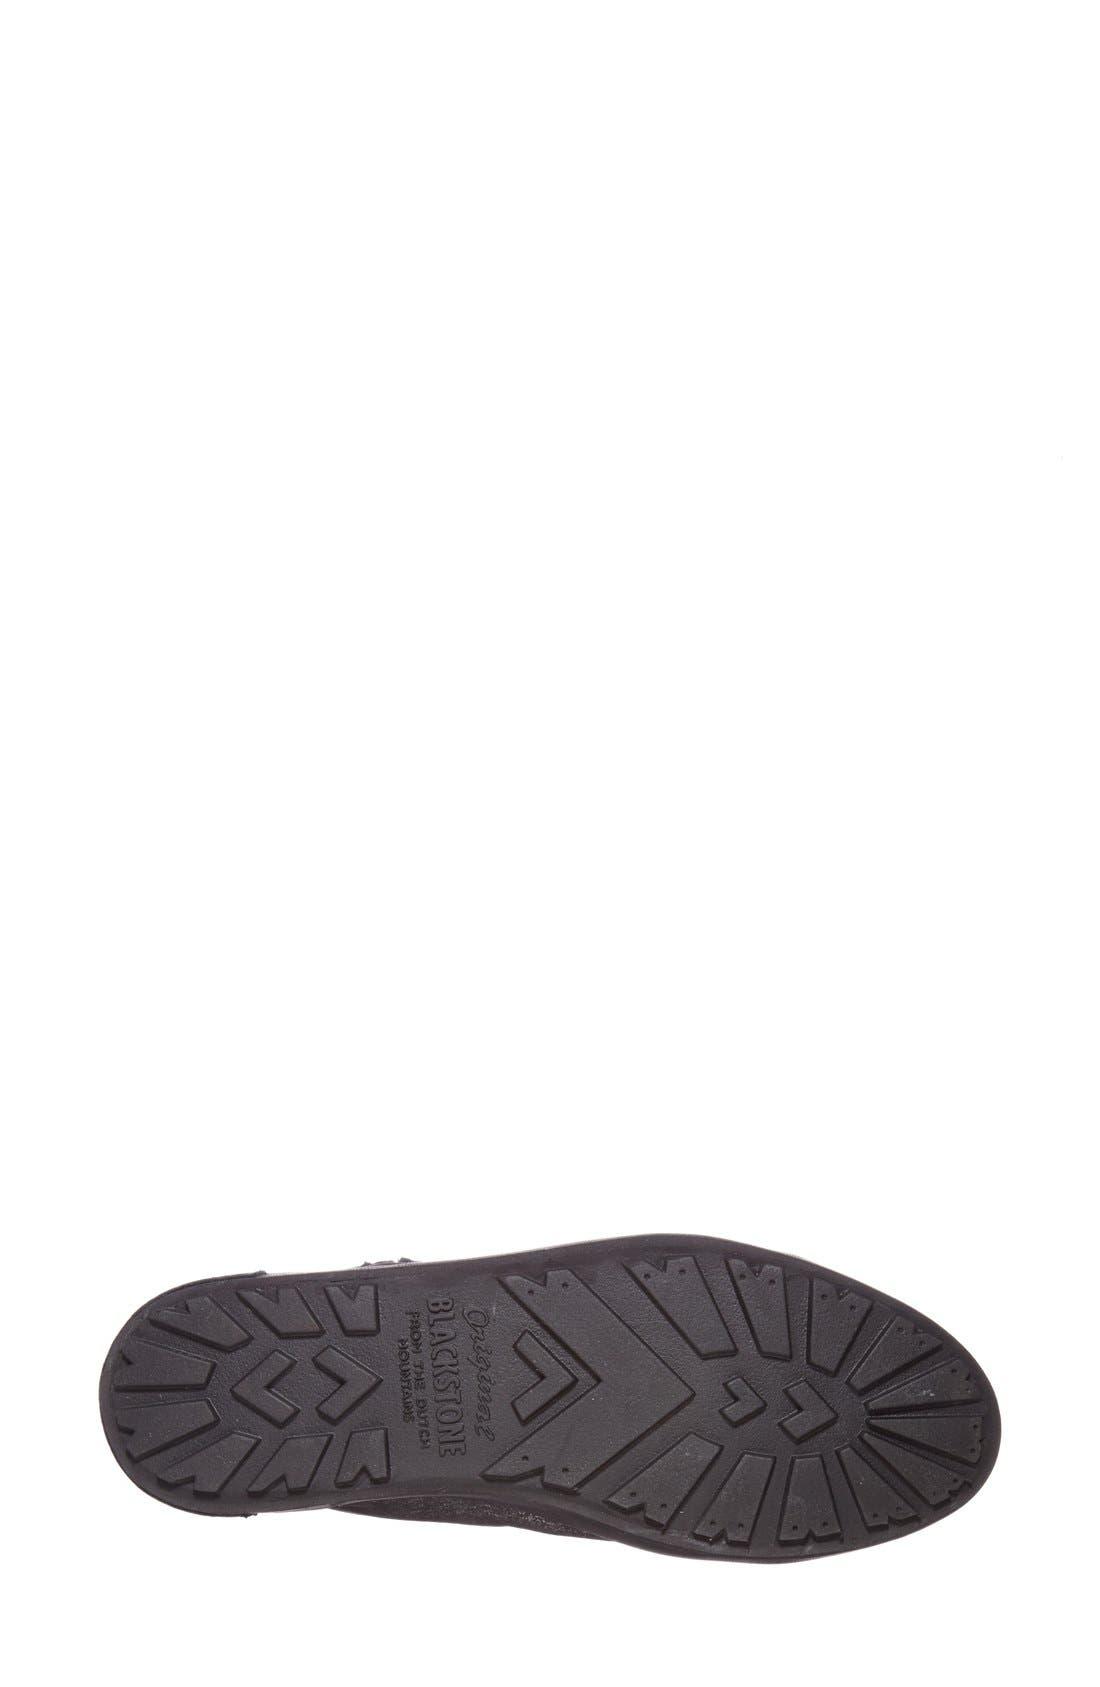 'JL' High Top Sneaker,                             Alternate thumbnail 4, color,                             Black Metallic